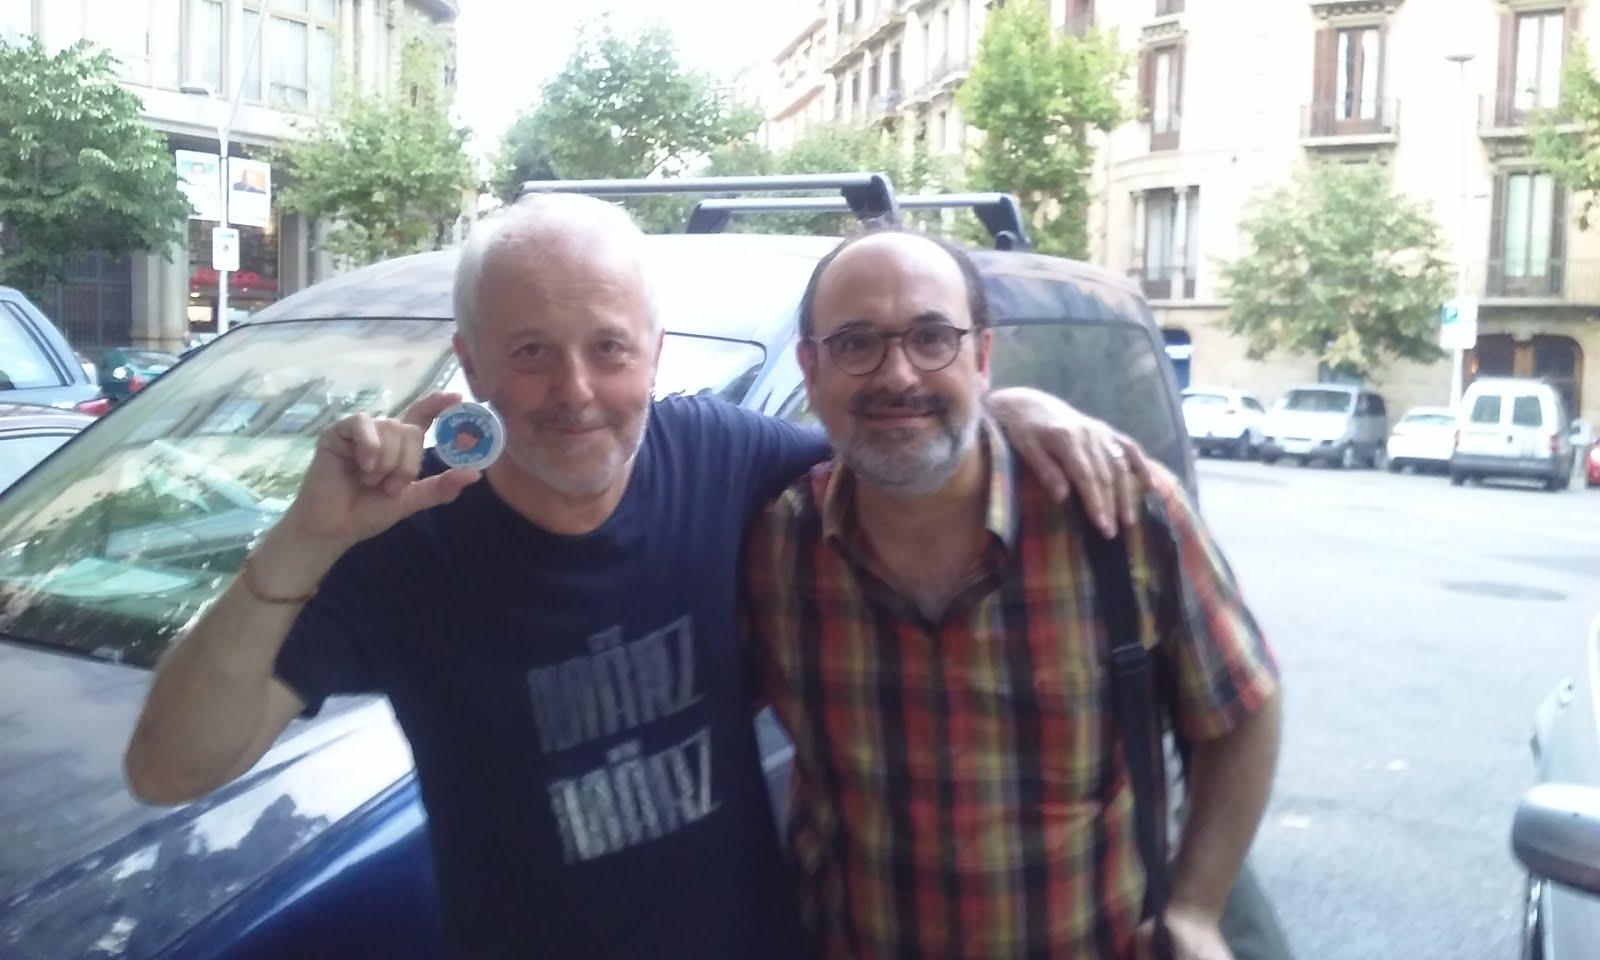 Amb en Jordi Batiste